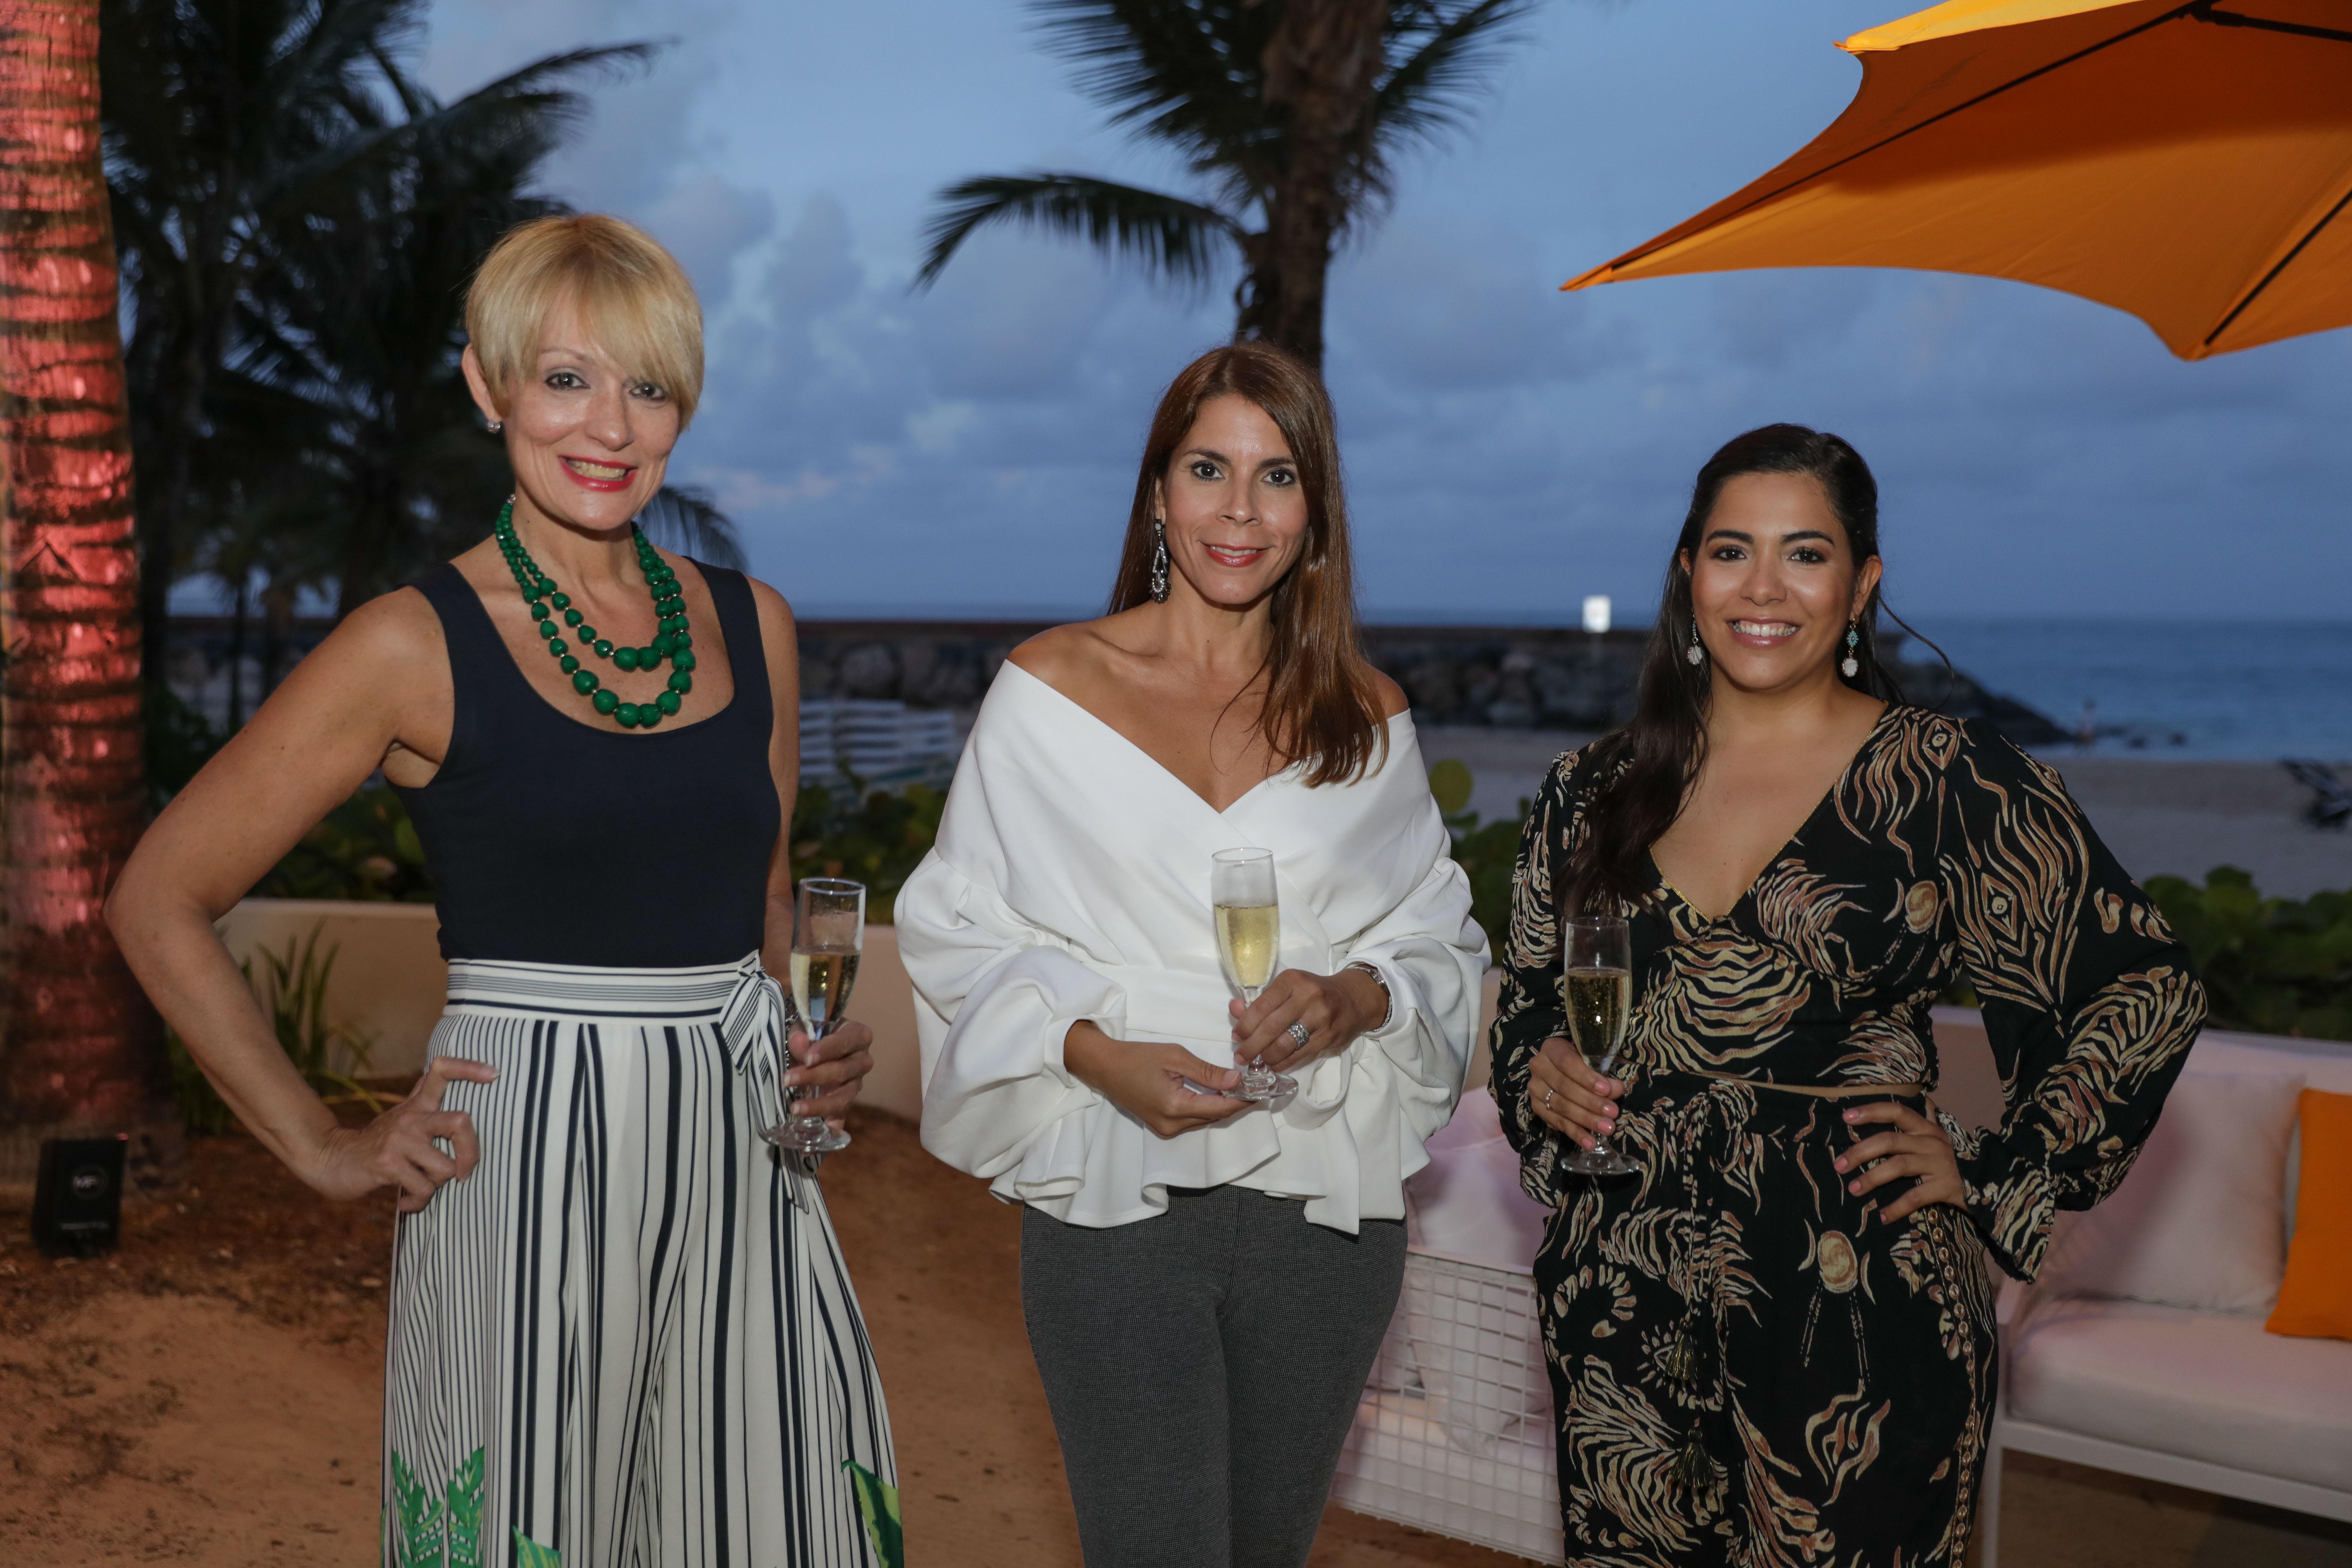 Brenda Pizarro, Coralis Torres, Glendaliz Acevedo y Luz González (Suministrada)